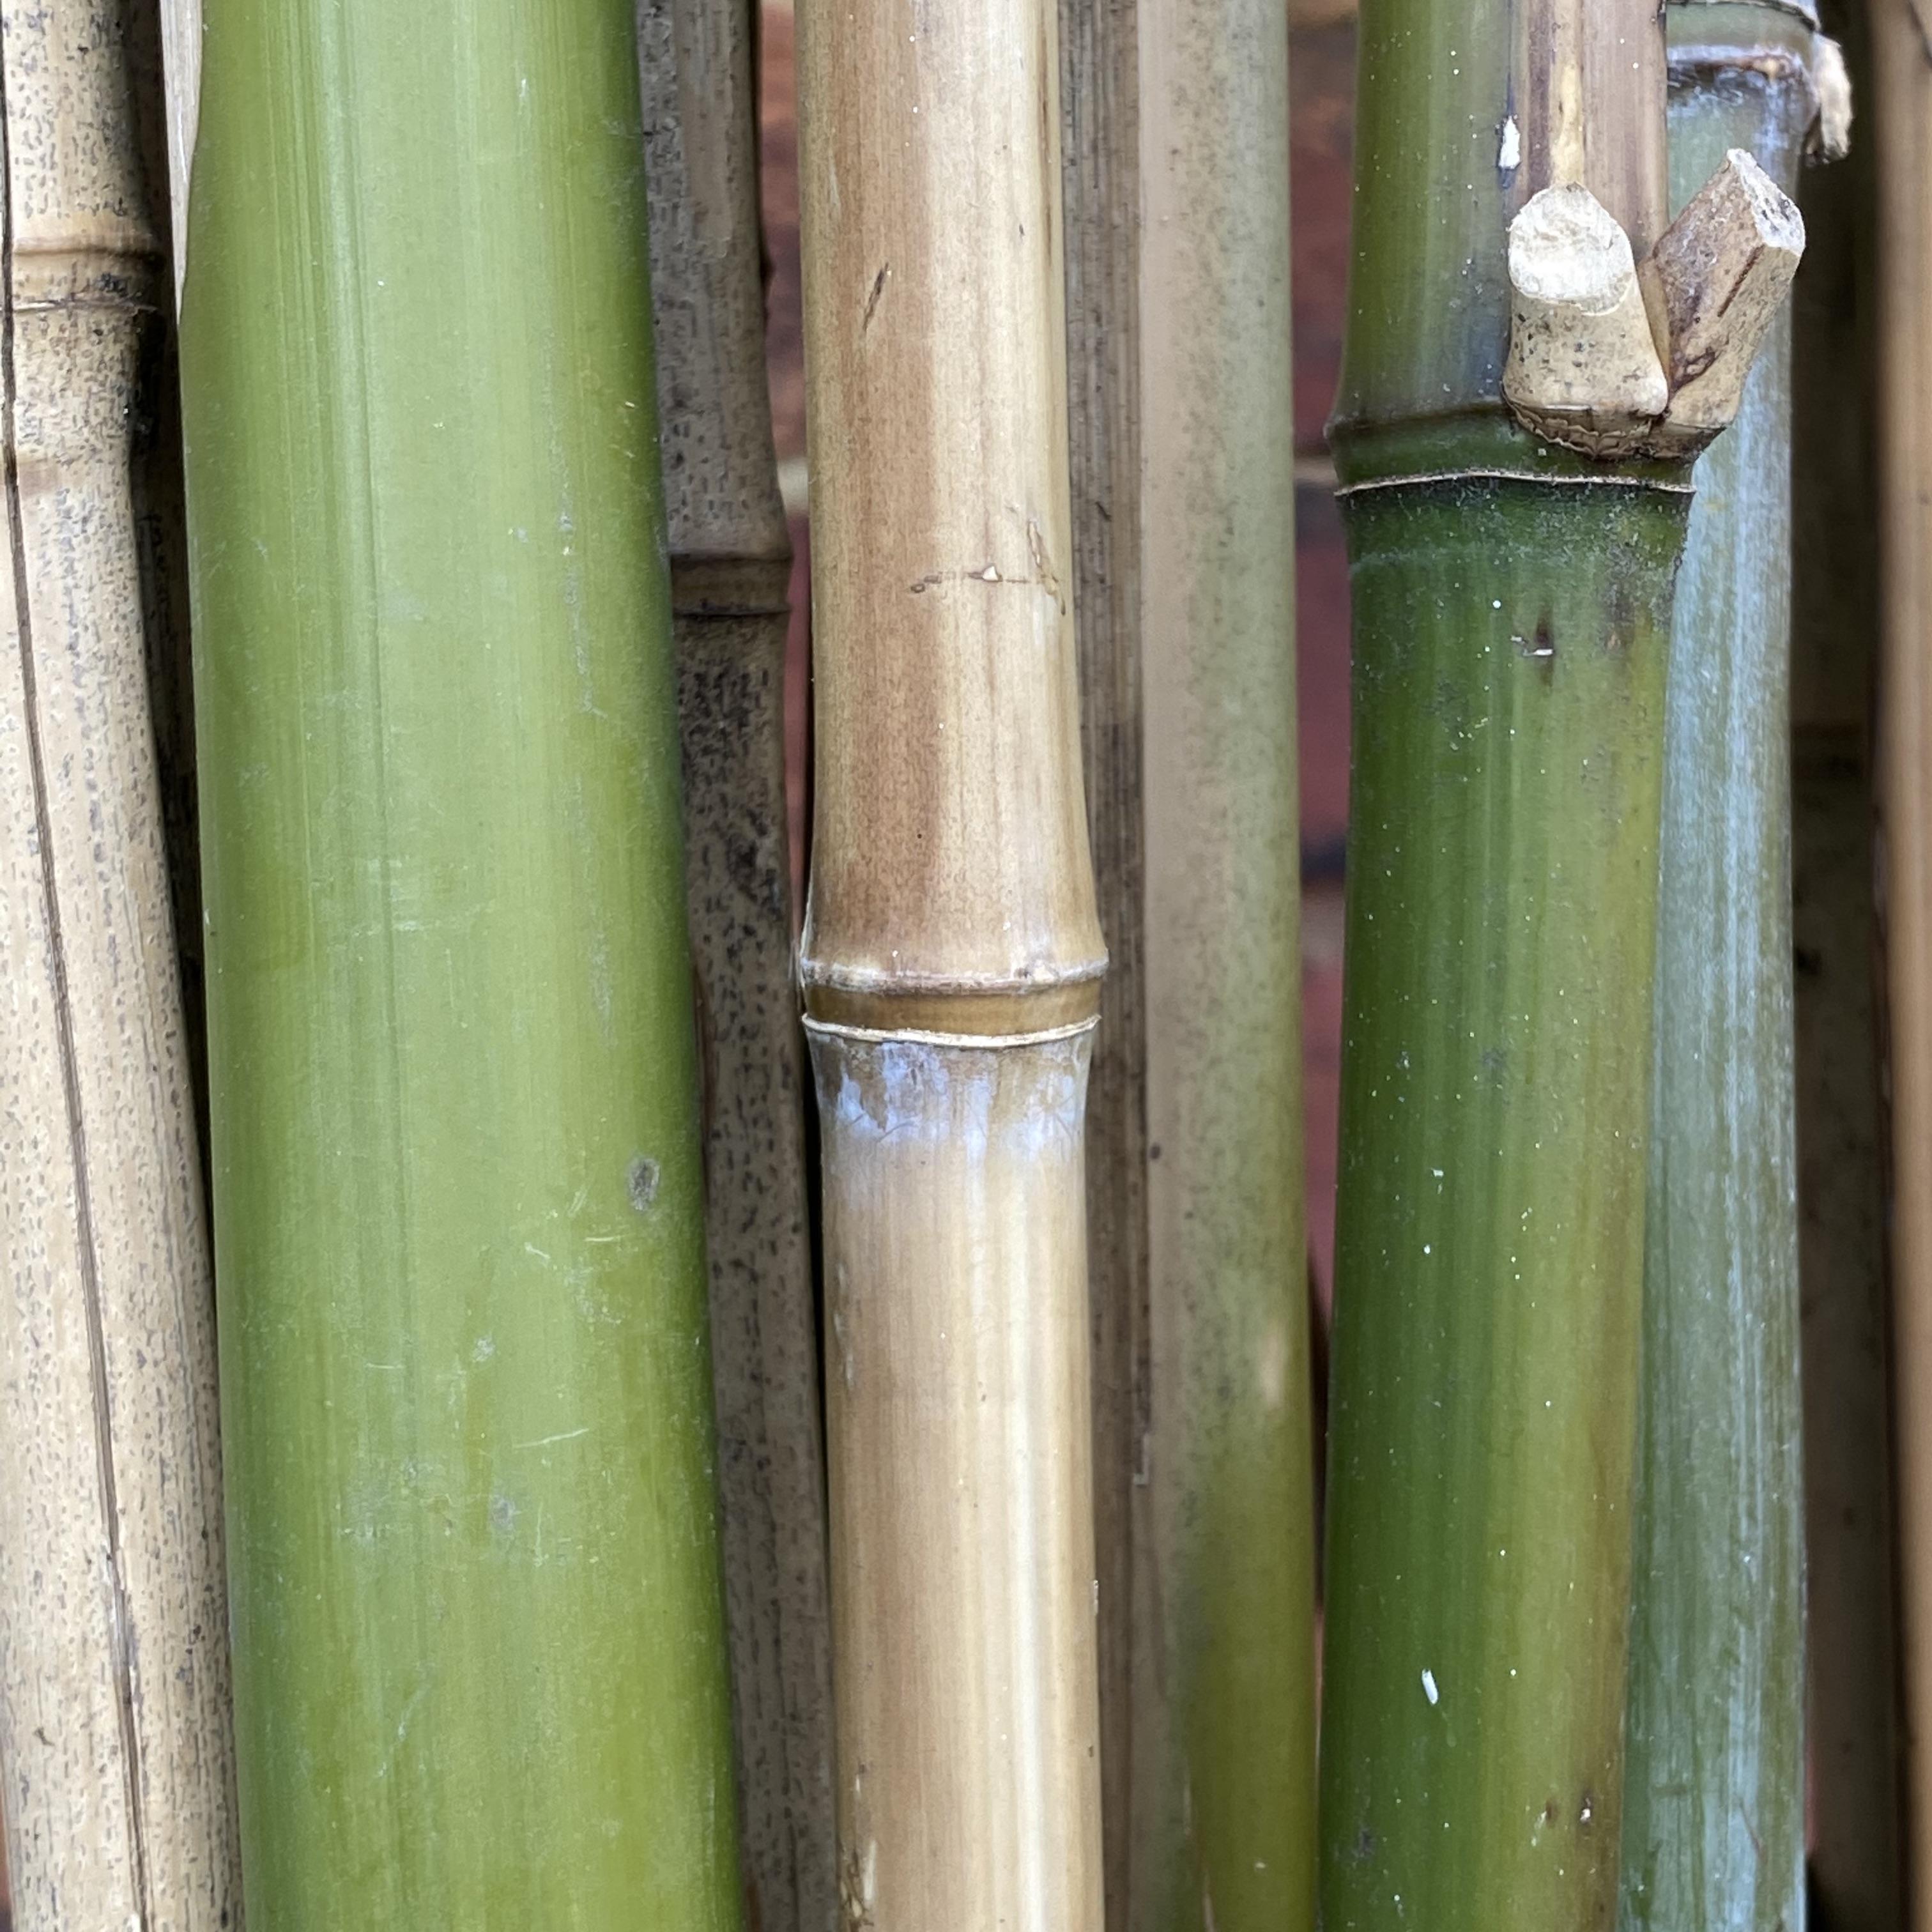 London Grown Bamboo Cane